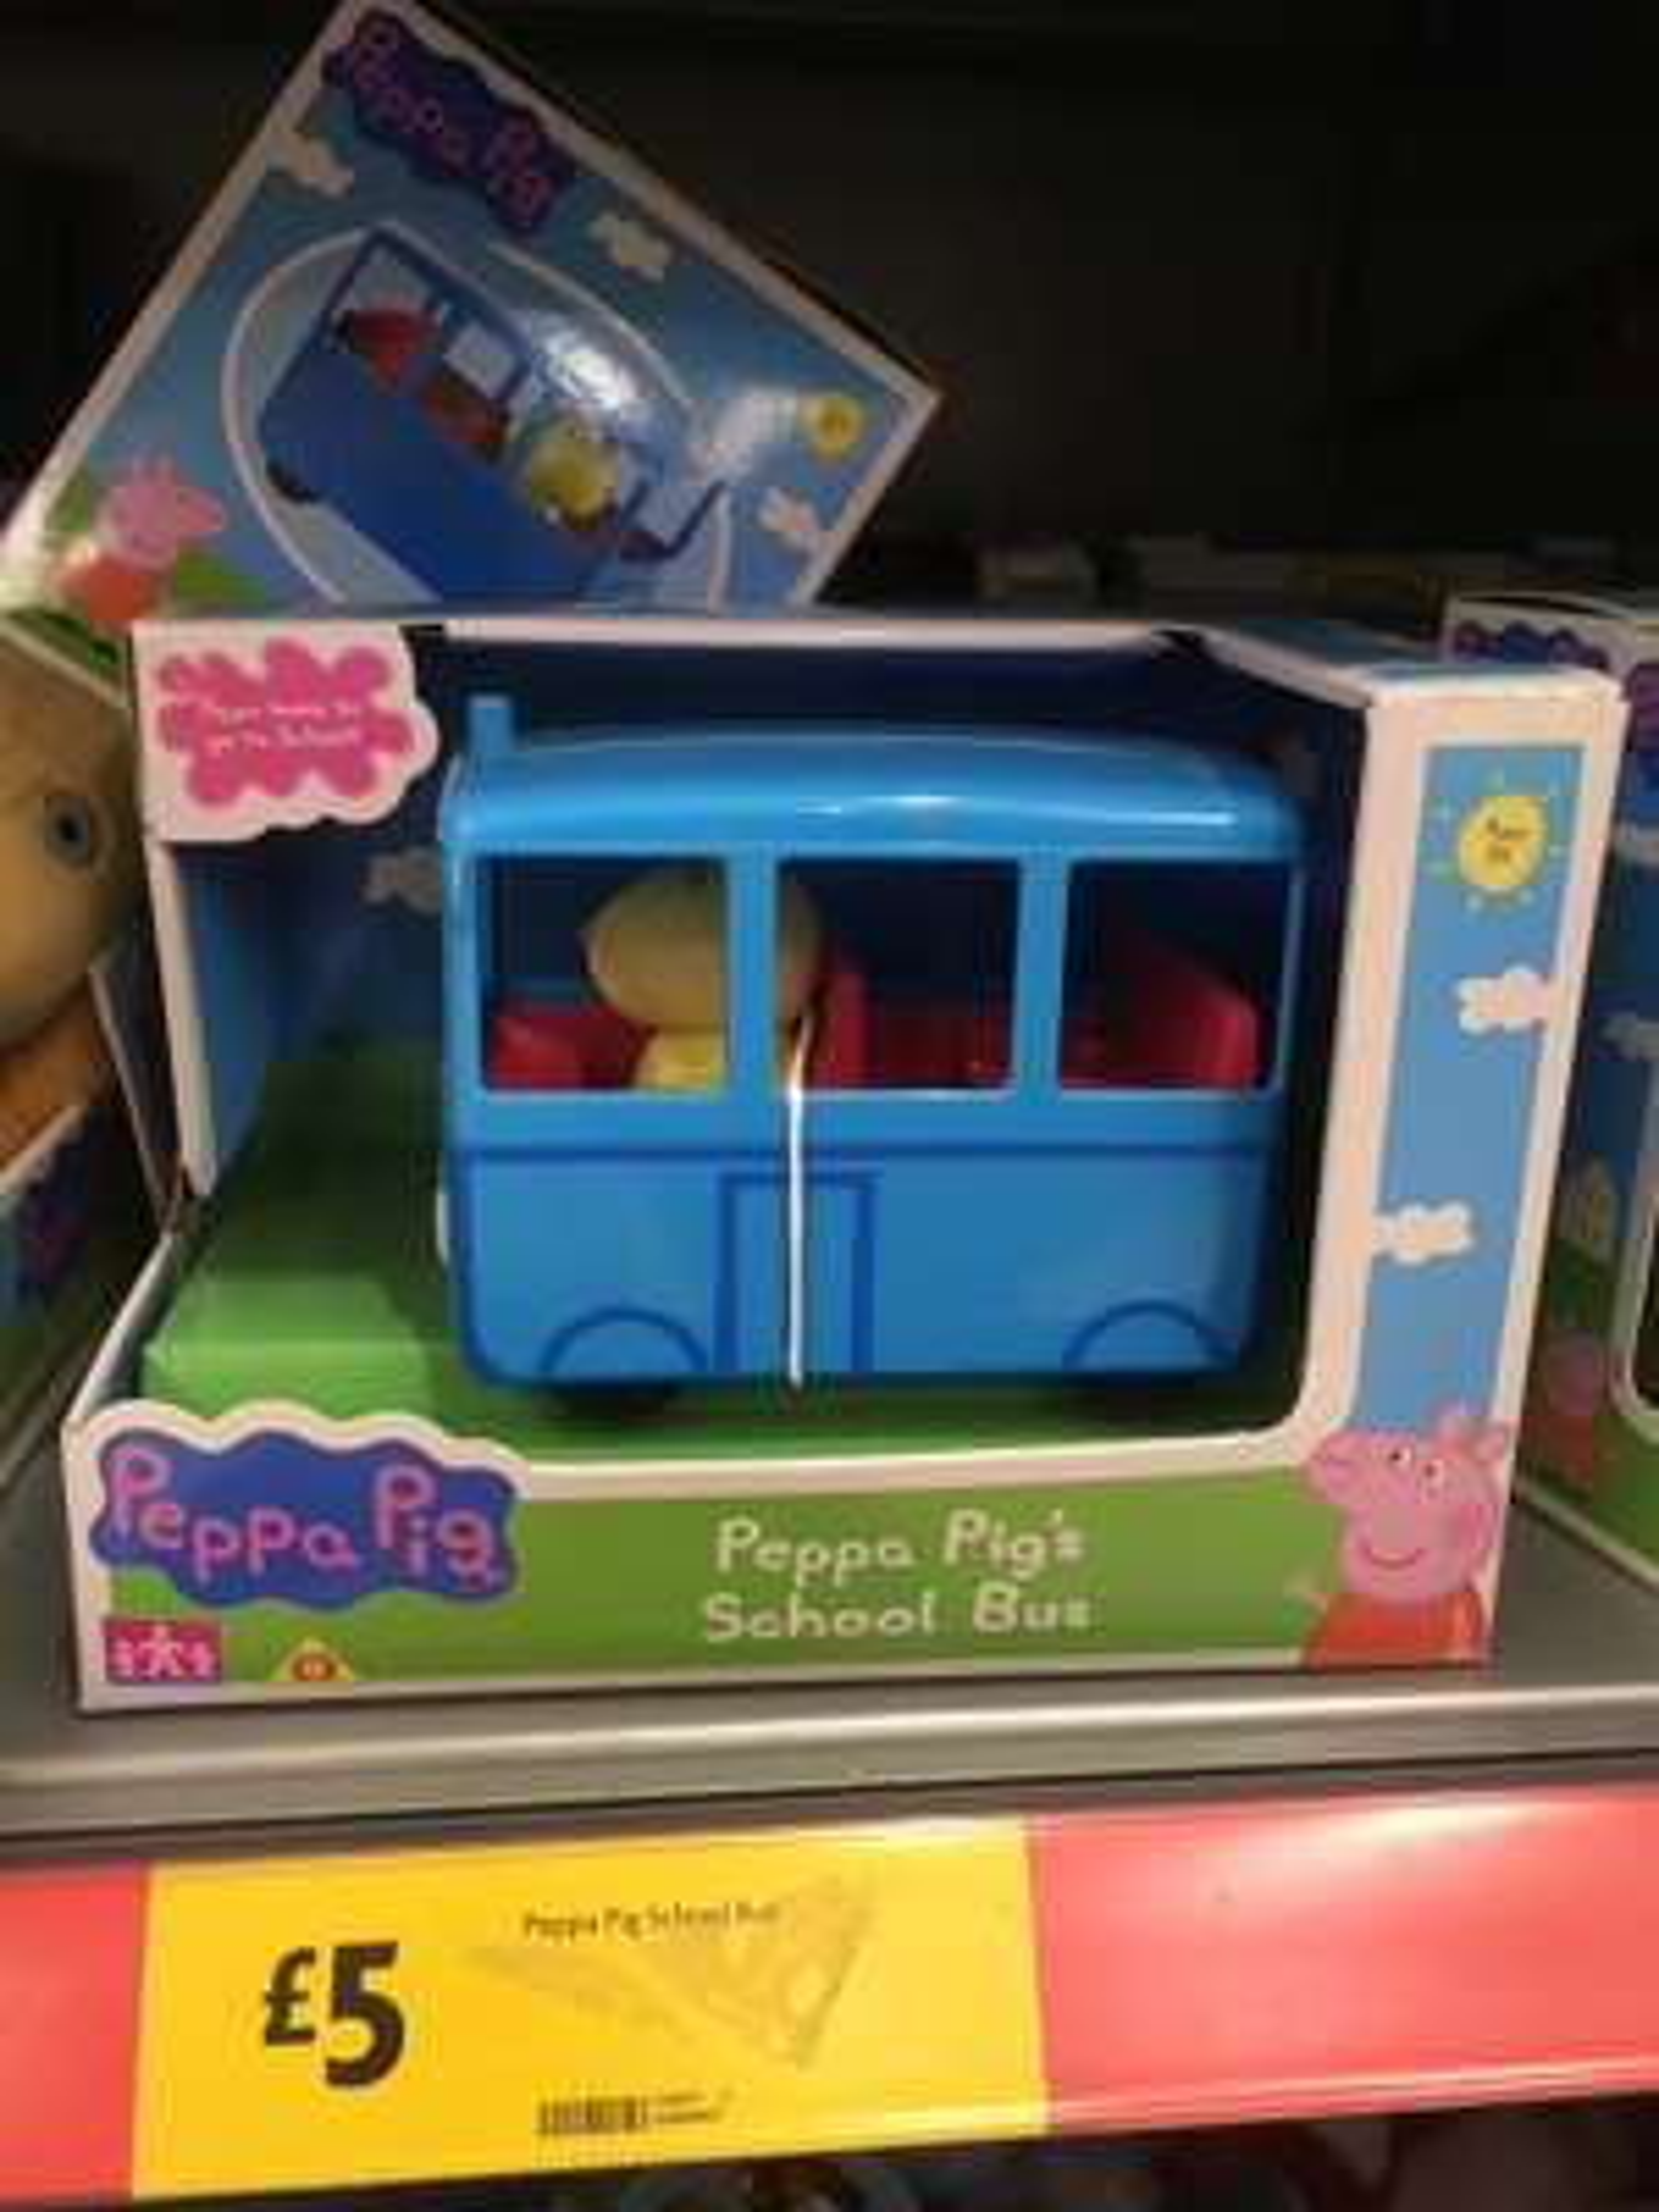 Peppa Pig Bus instore £5 Morrisons Redditch